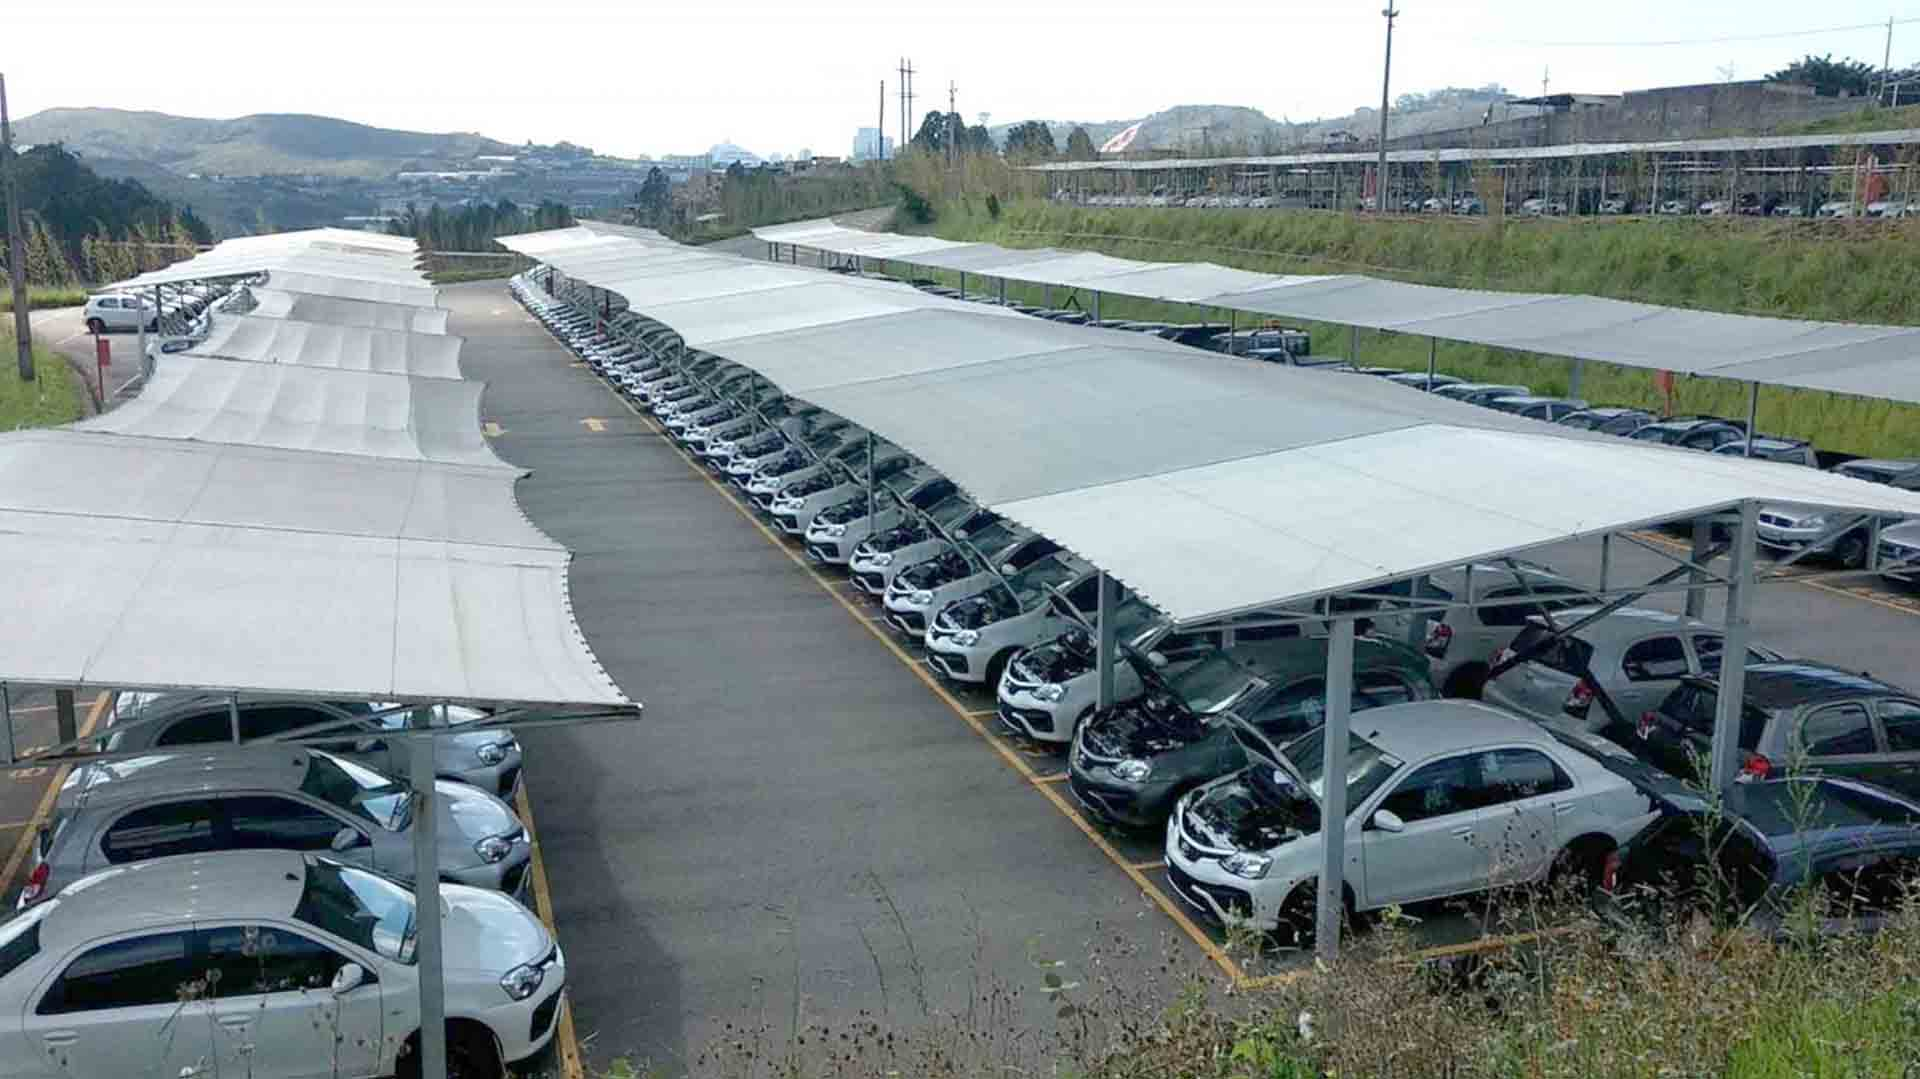 Parqueamento e guarda de veículos